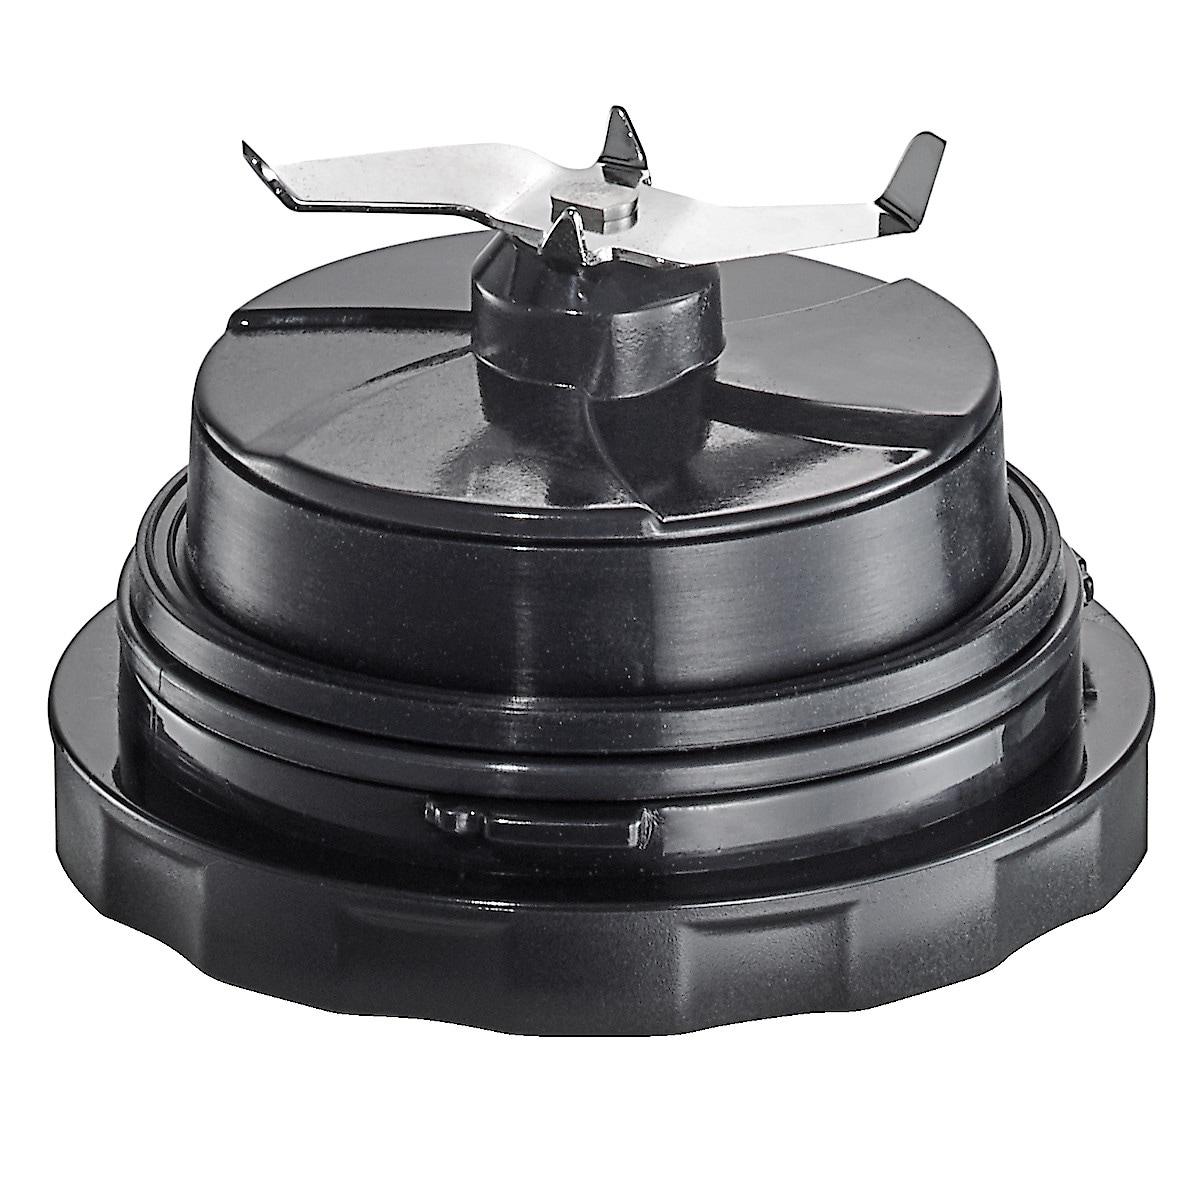 Standmixer Bosch VitaStyle Mixx2Go, MMBM7G3M